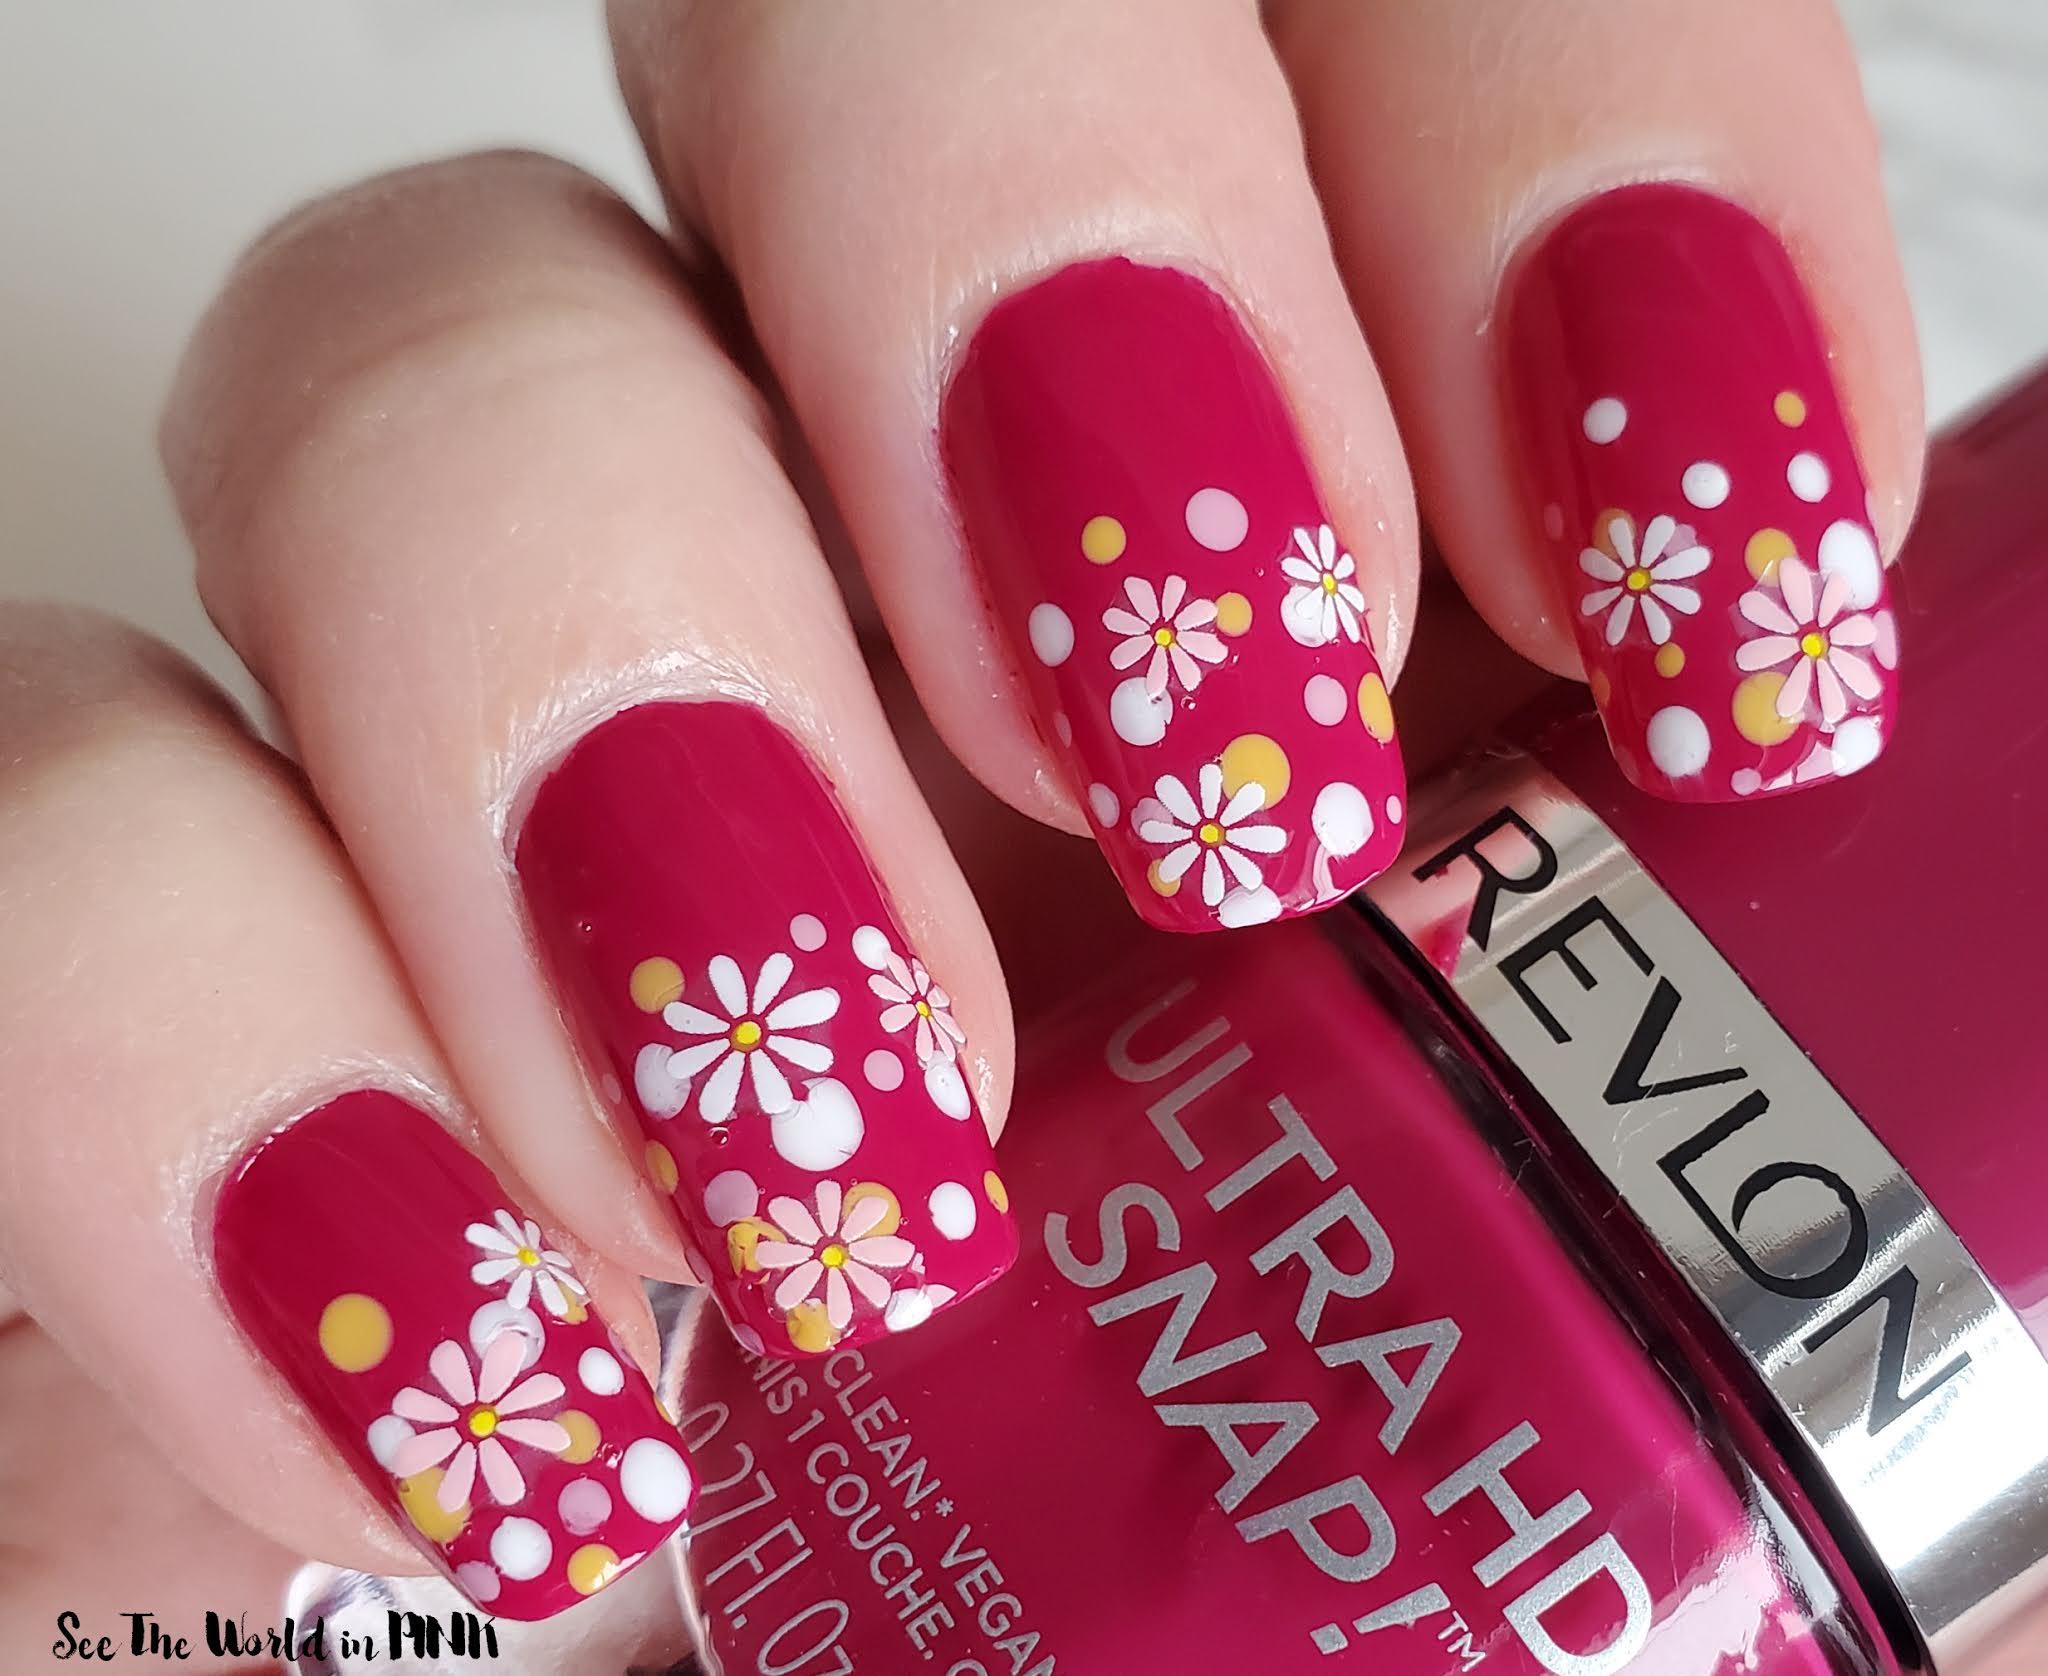 Manicure Monday - Daisy Dotticure Nails